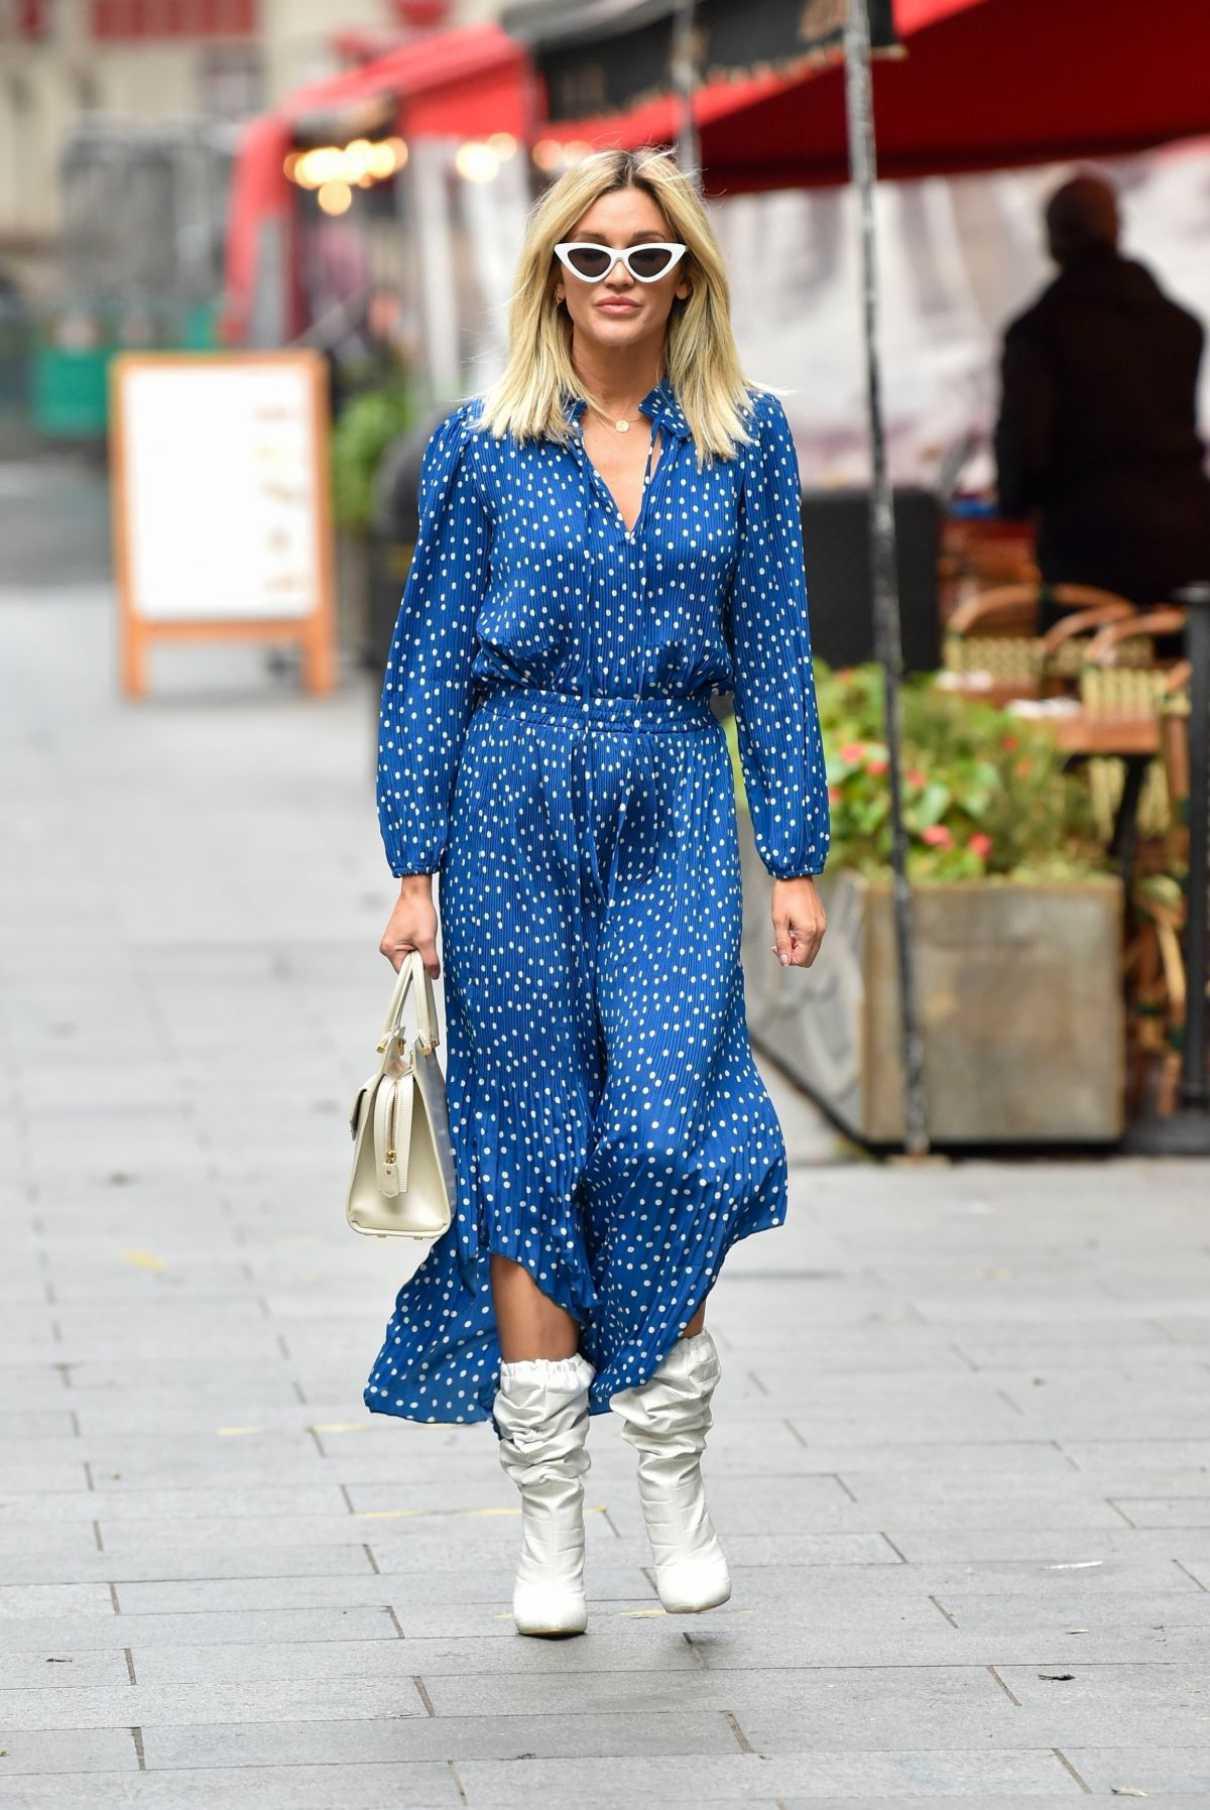 Ashley Roberts in a Blue Polka Dot Dress